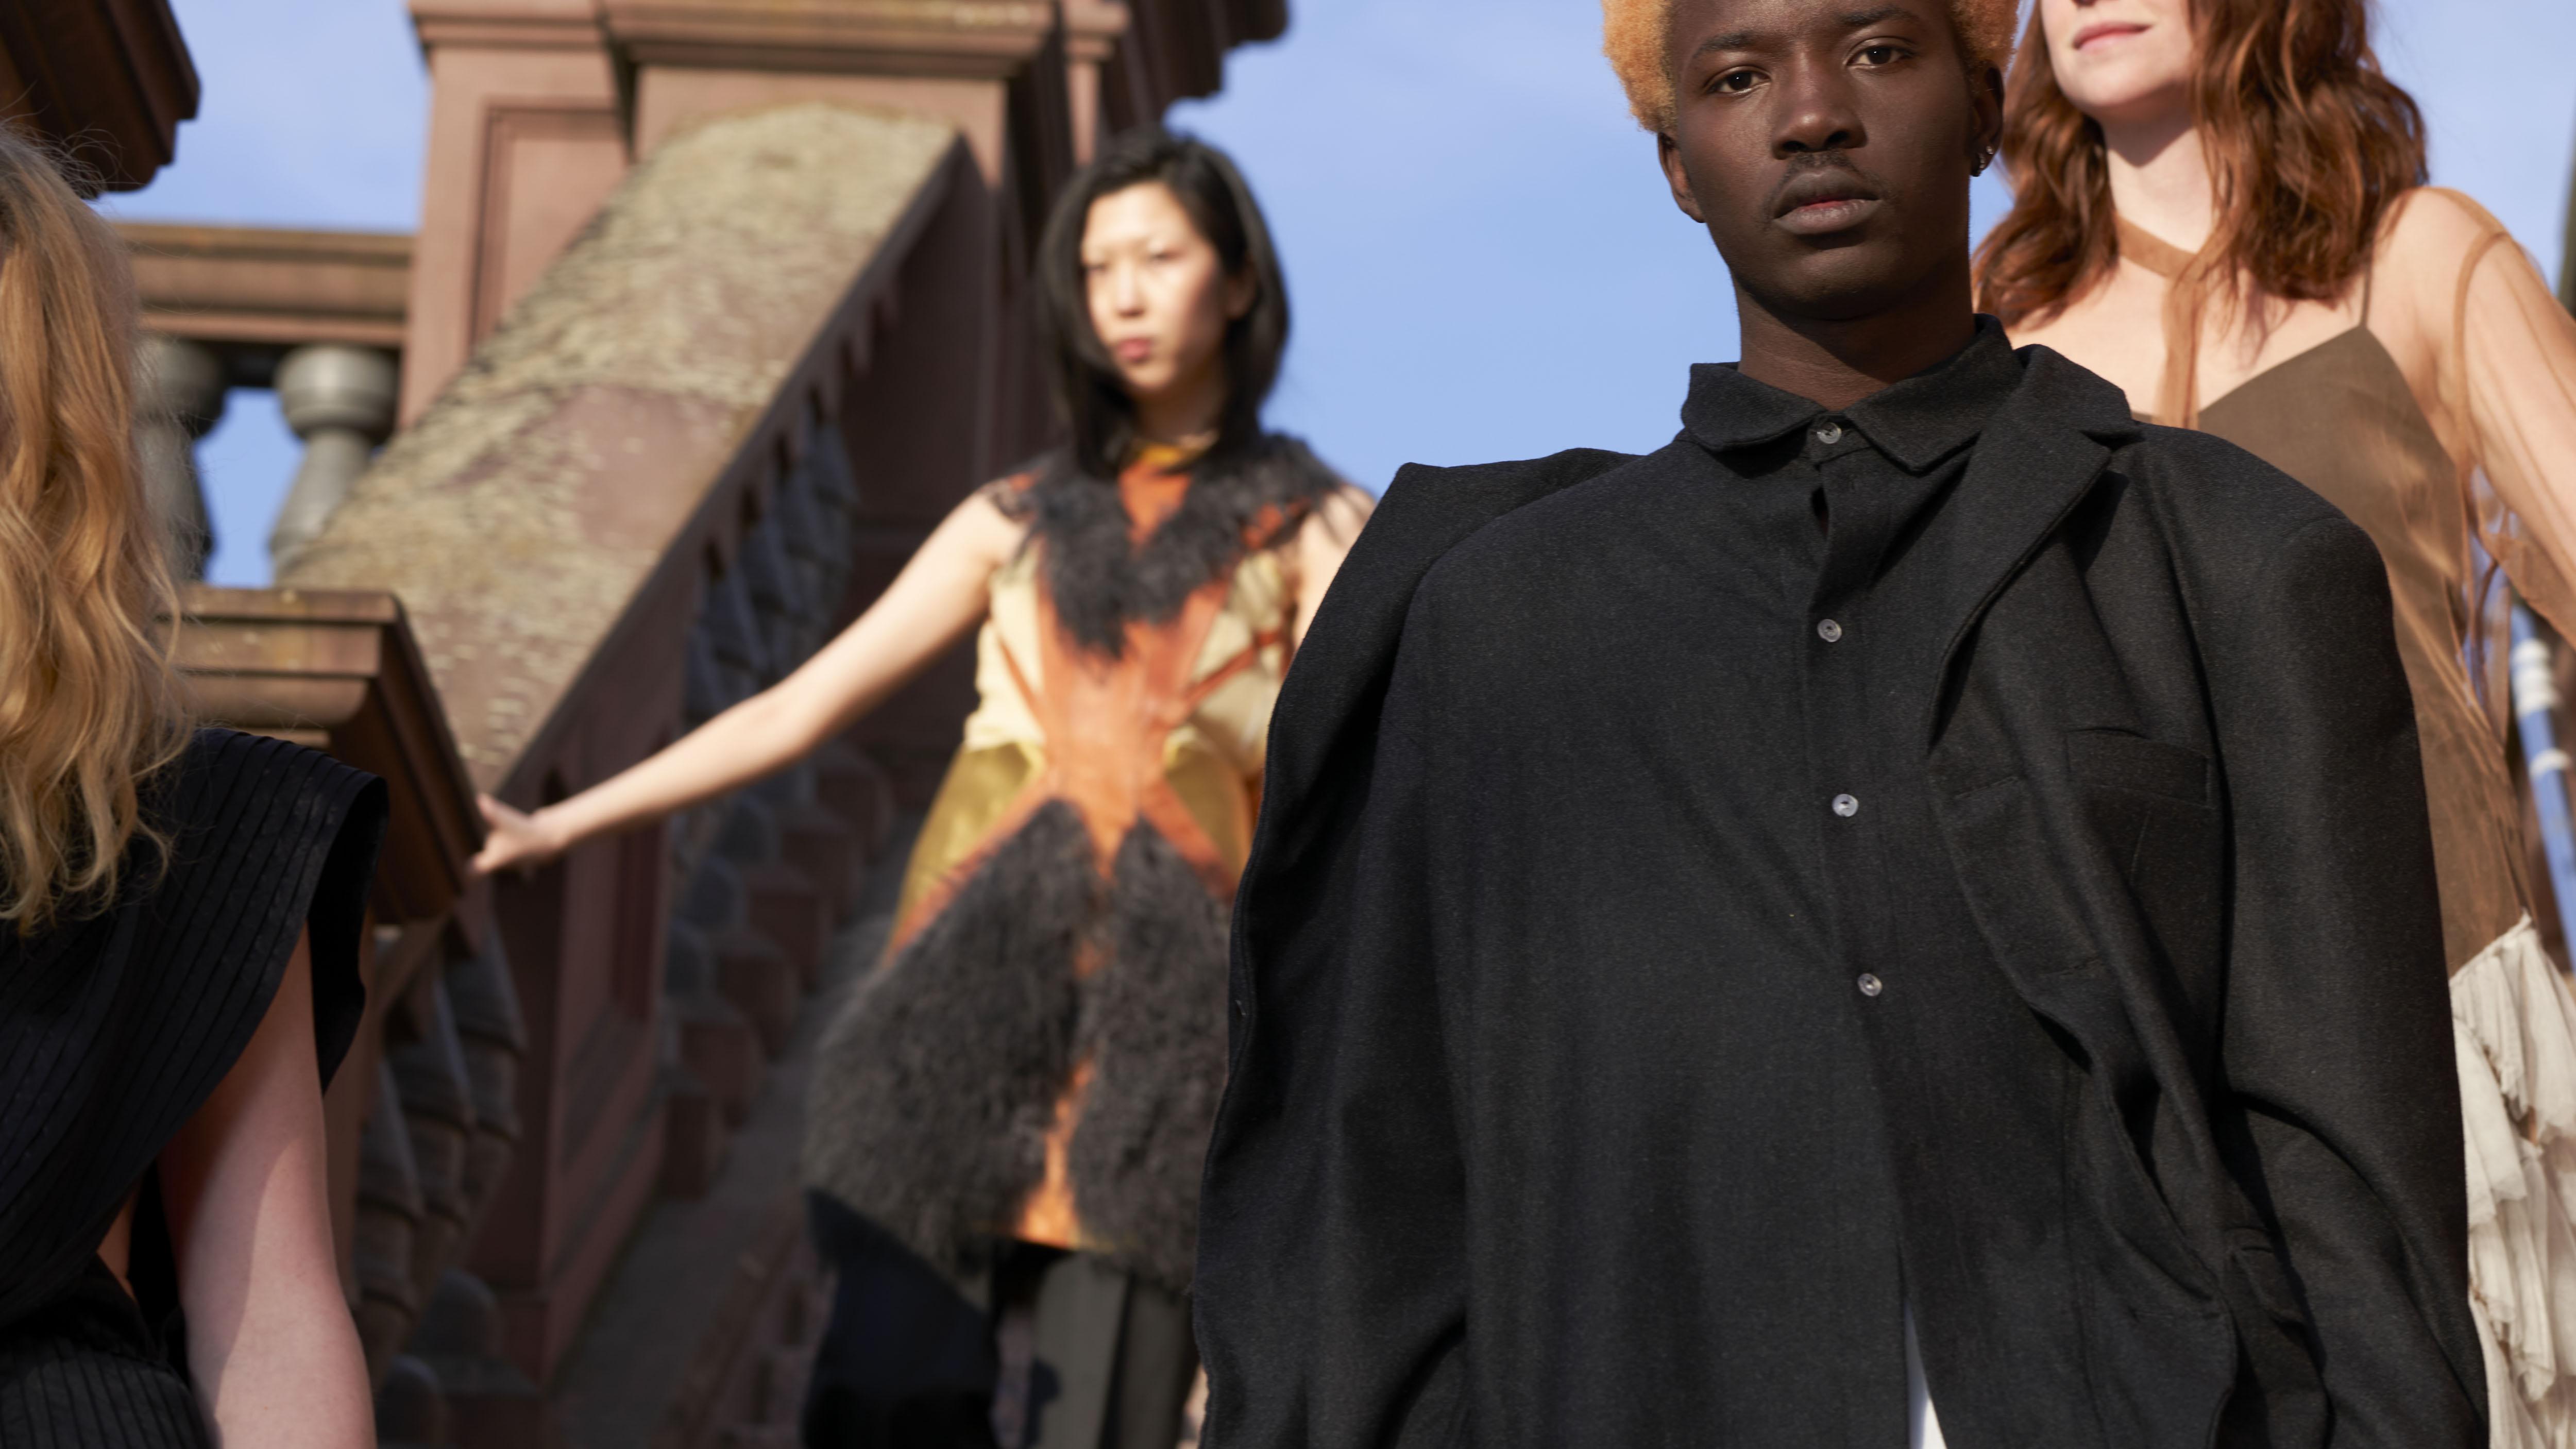 An image from Frankfurt Fashion Week's new brand identity.